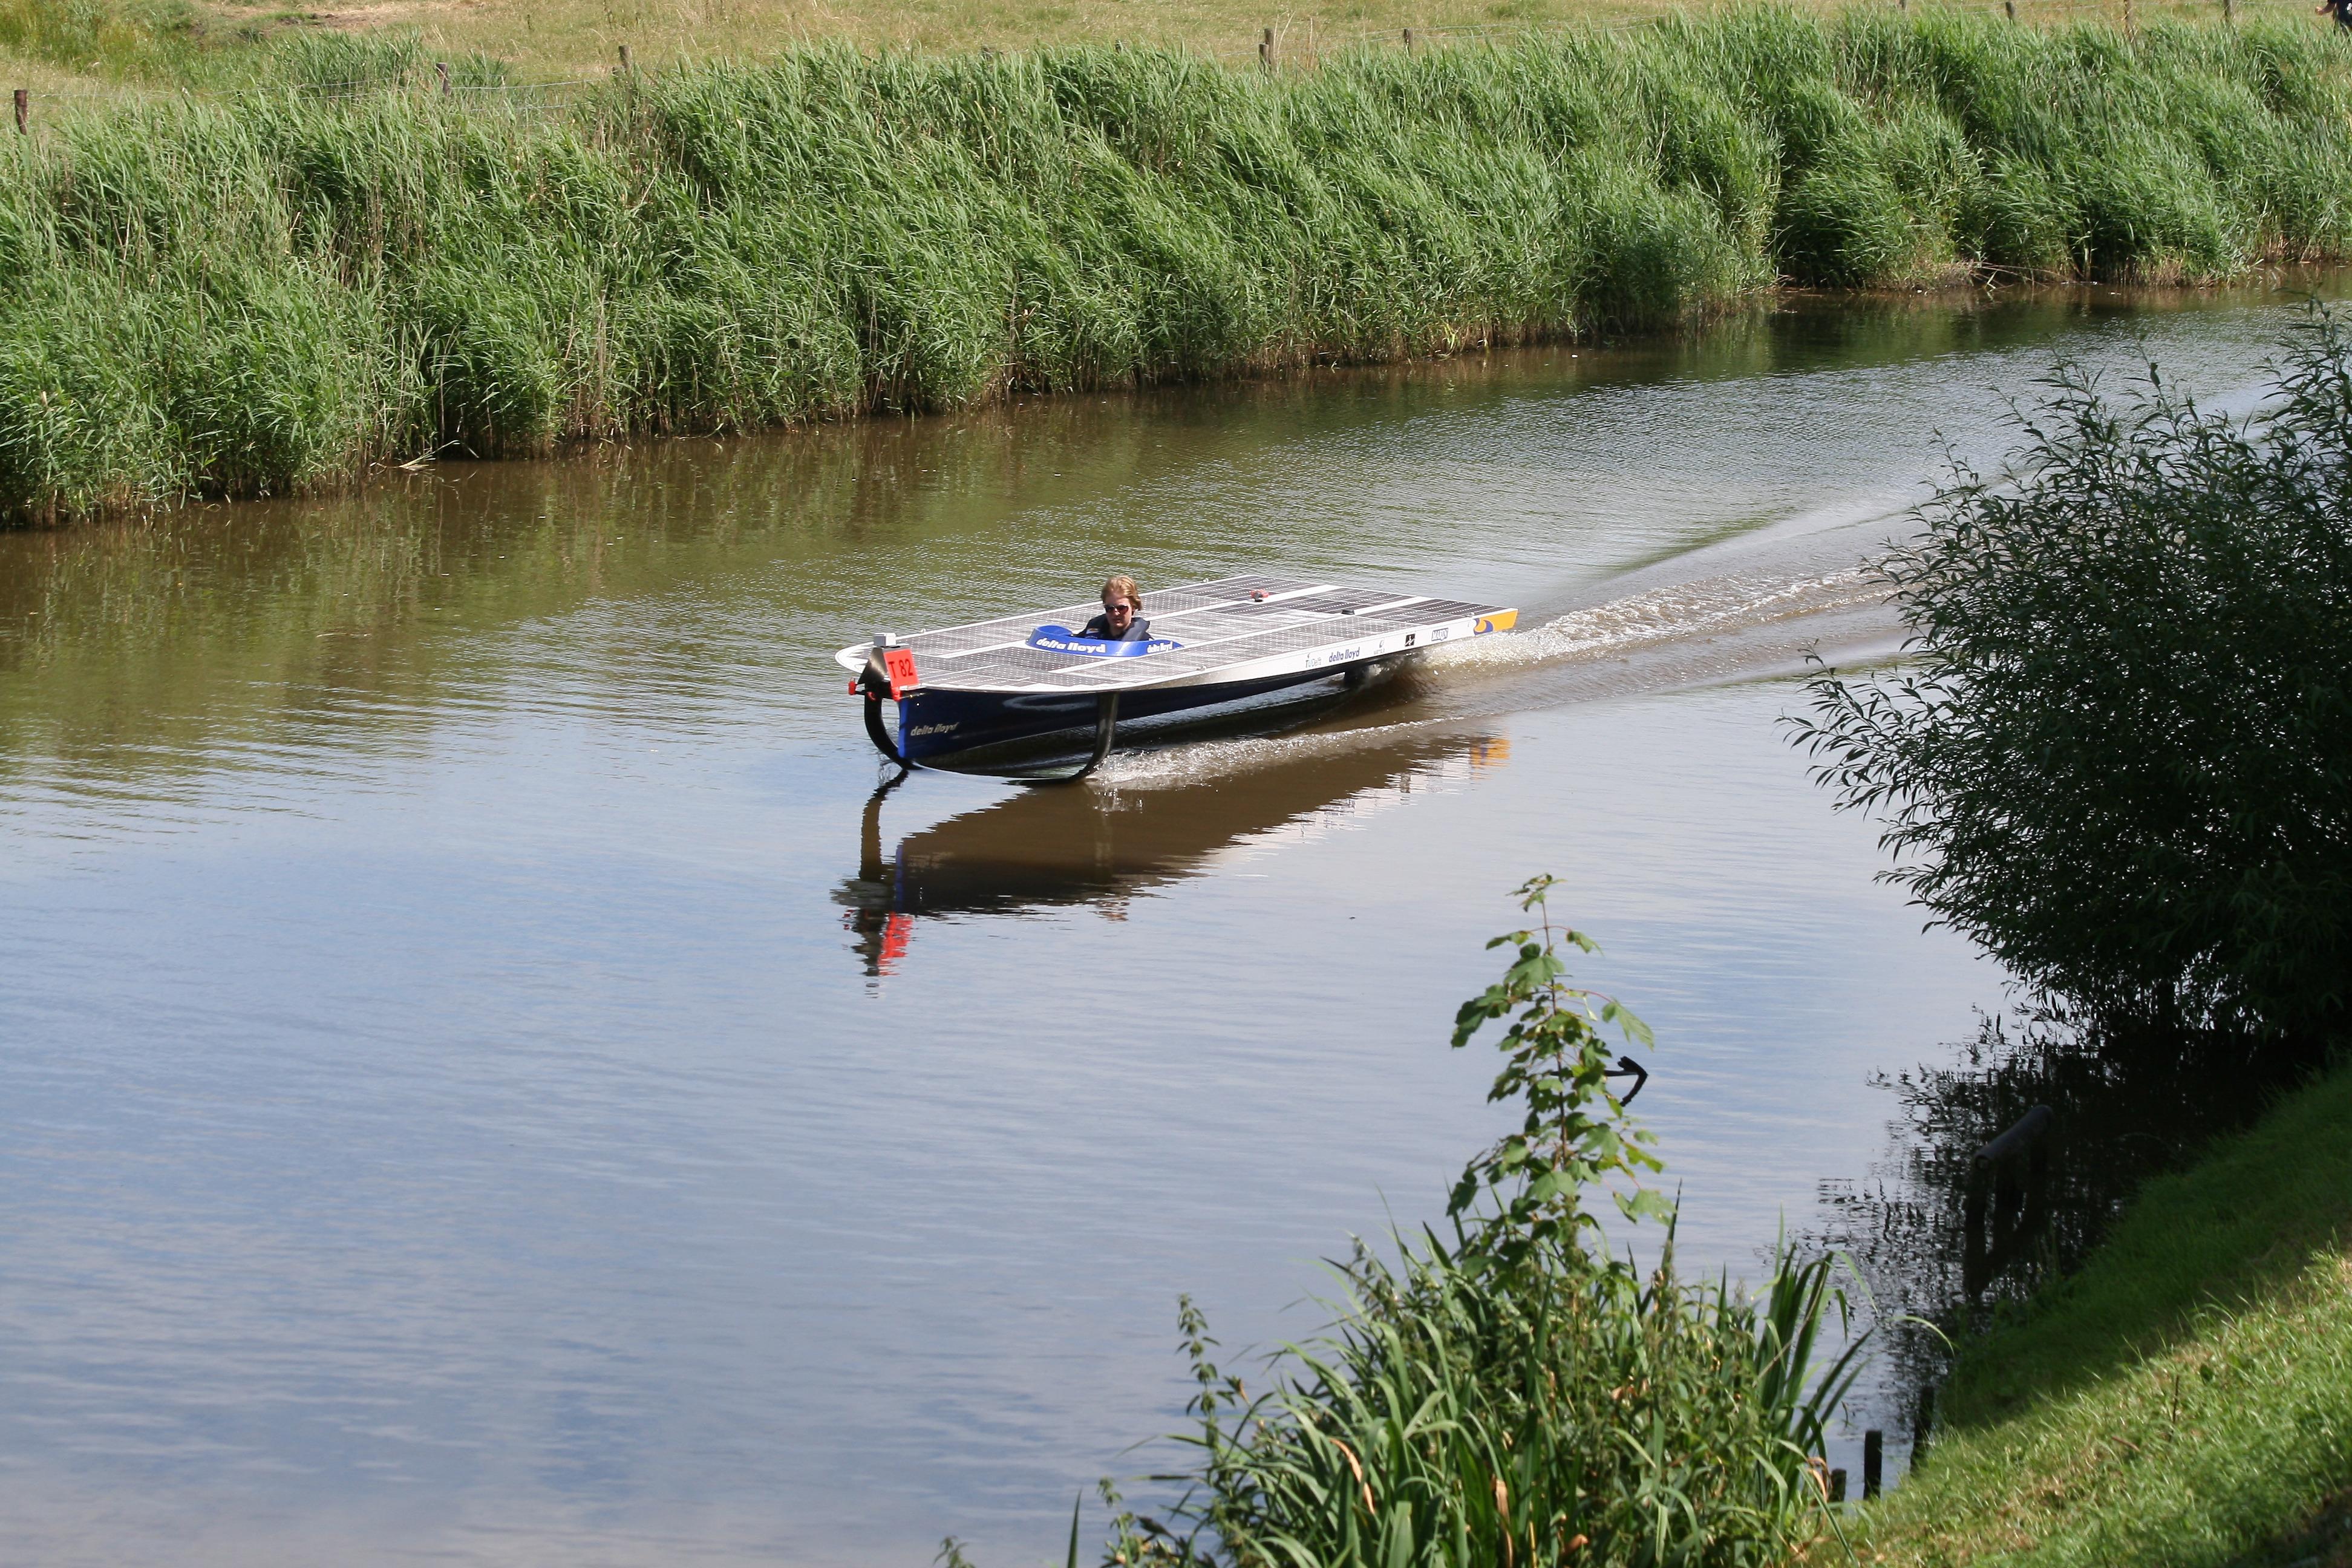 Solar boat challenger uses Kvaser interfaces for telemetry